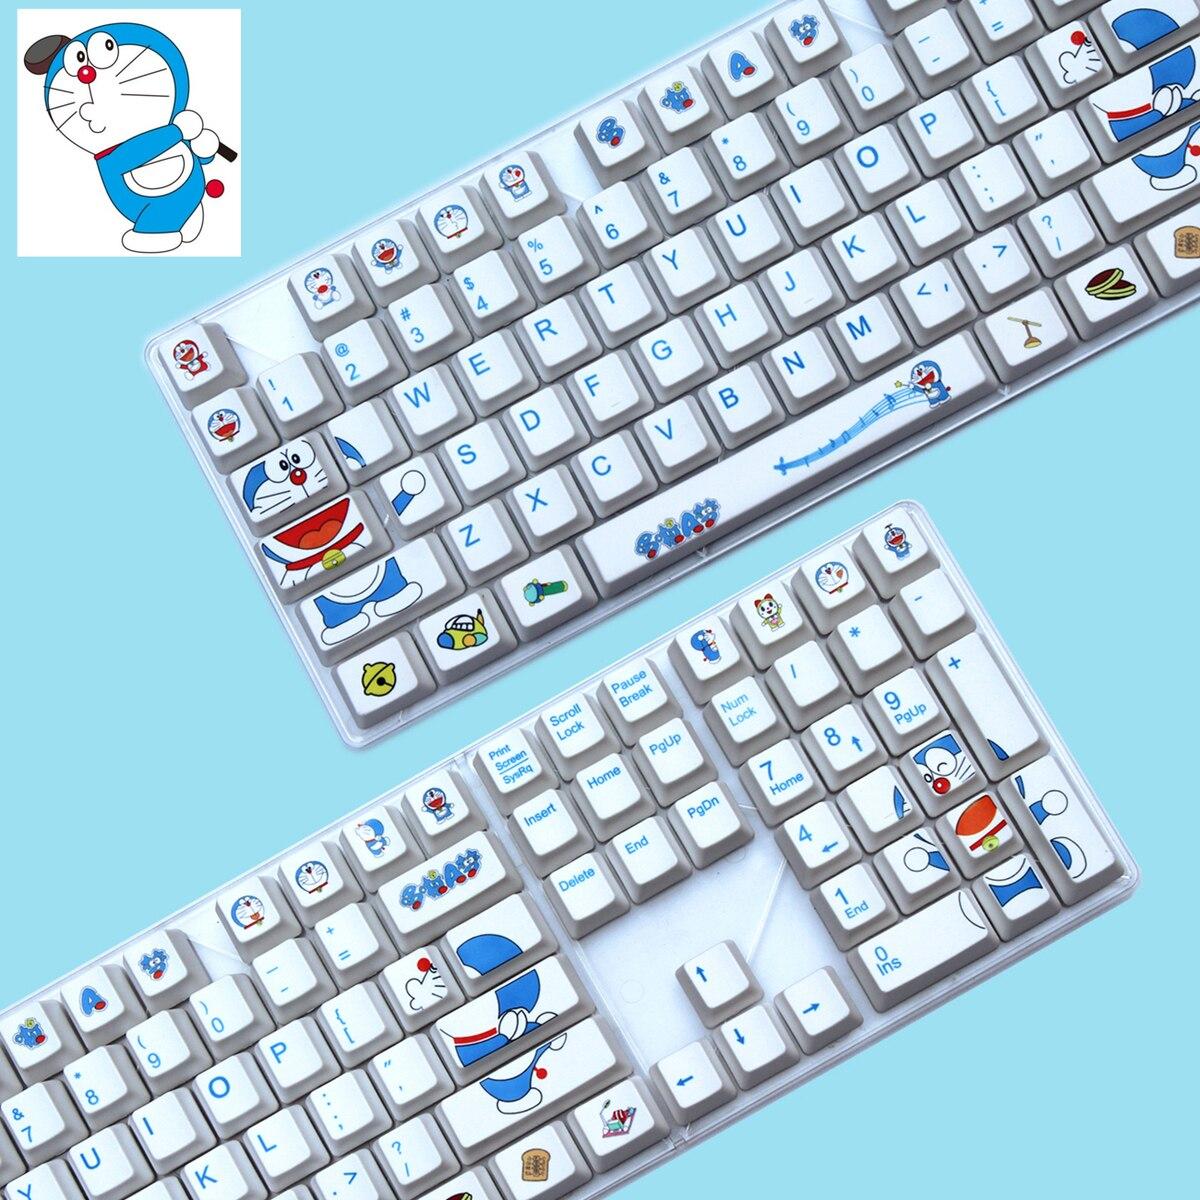 108 Keys/set PBT Dye-Sublimation Key Caps Personality Mechanical Keyboard Key Cap For Doraemon Filco IKBC OEM/Cherry Profile